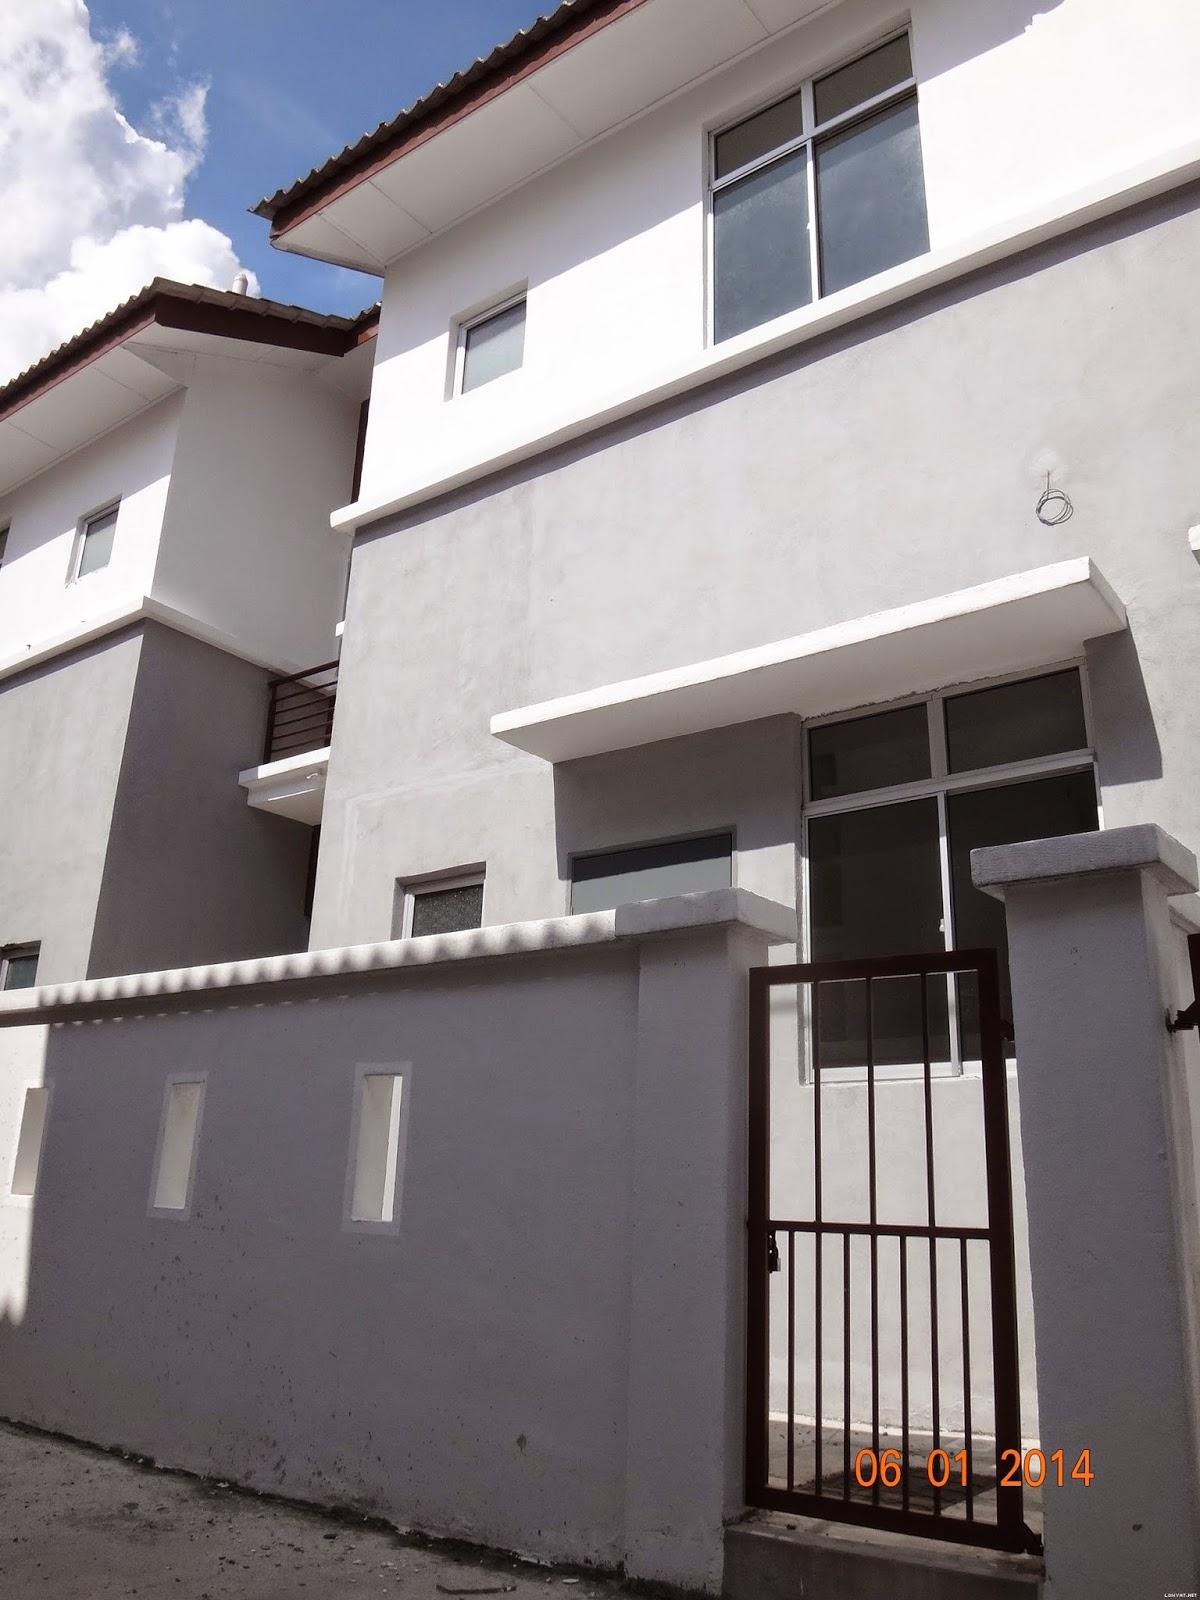 Malaysia Home Renovation Blog: 2 Storey Terrace House